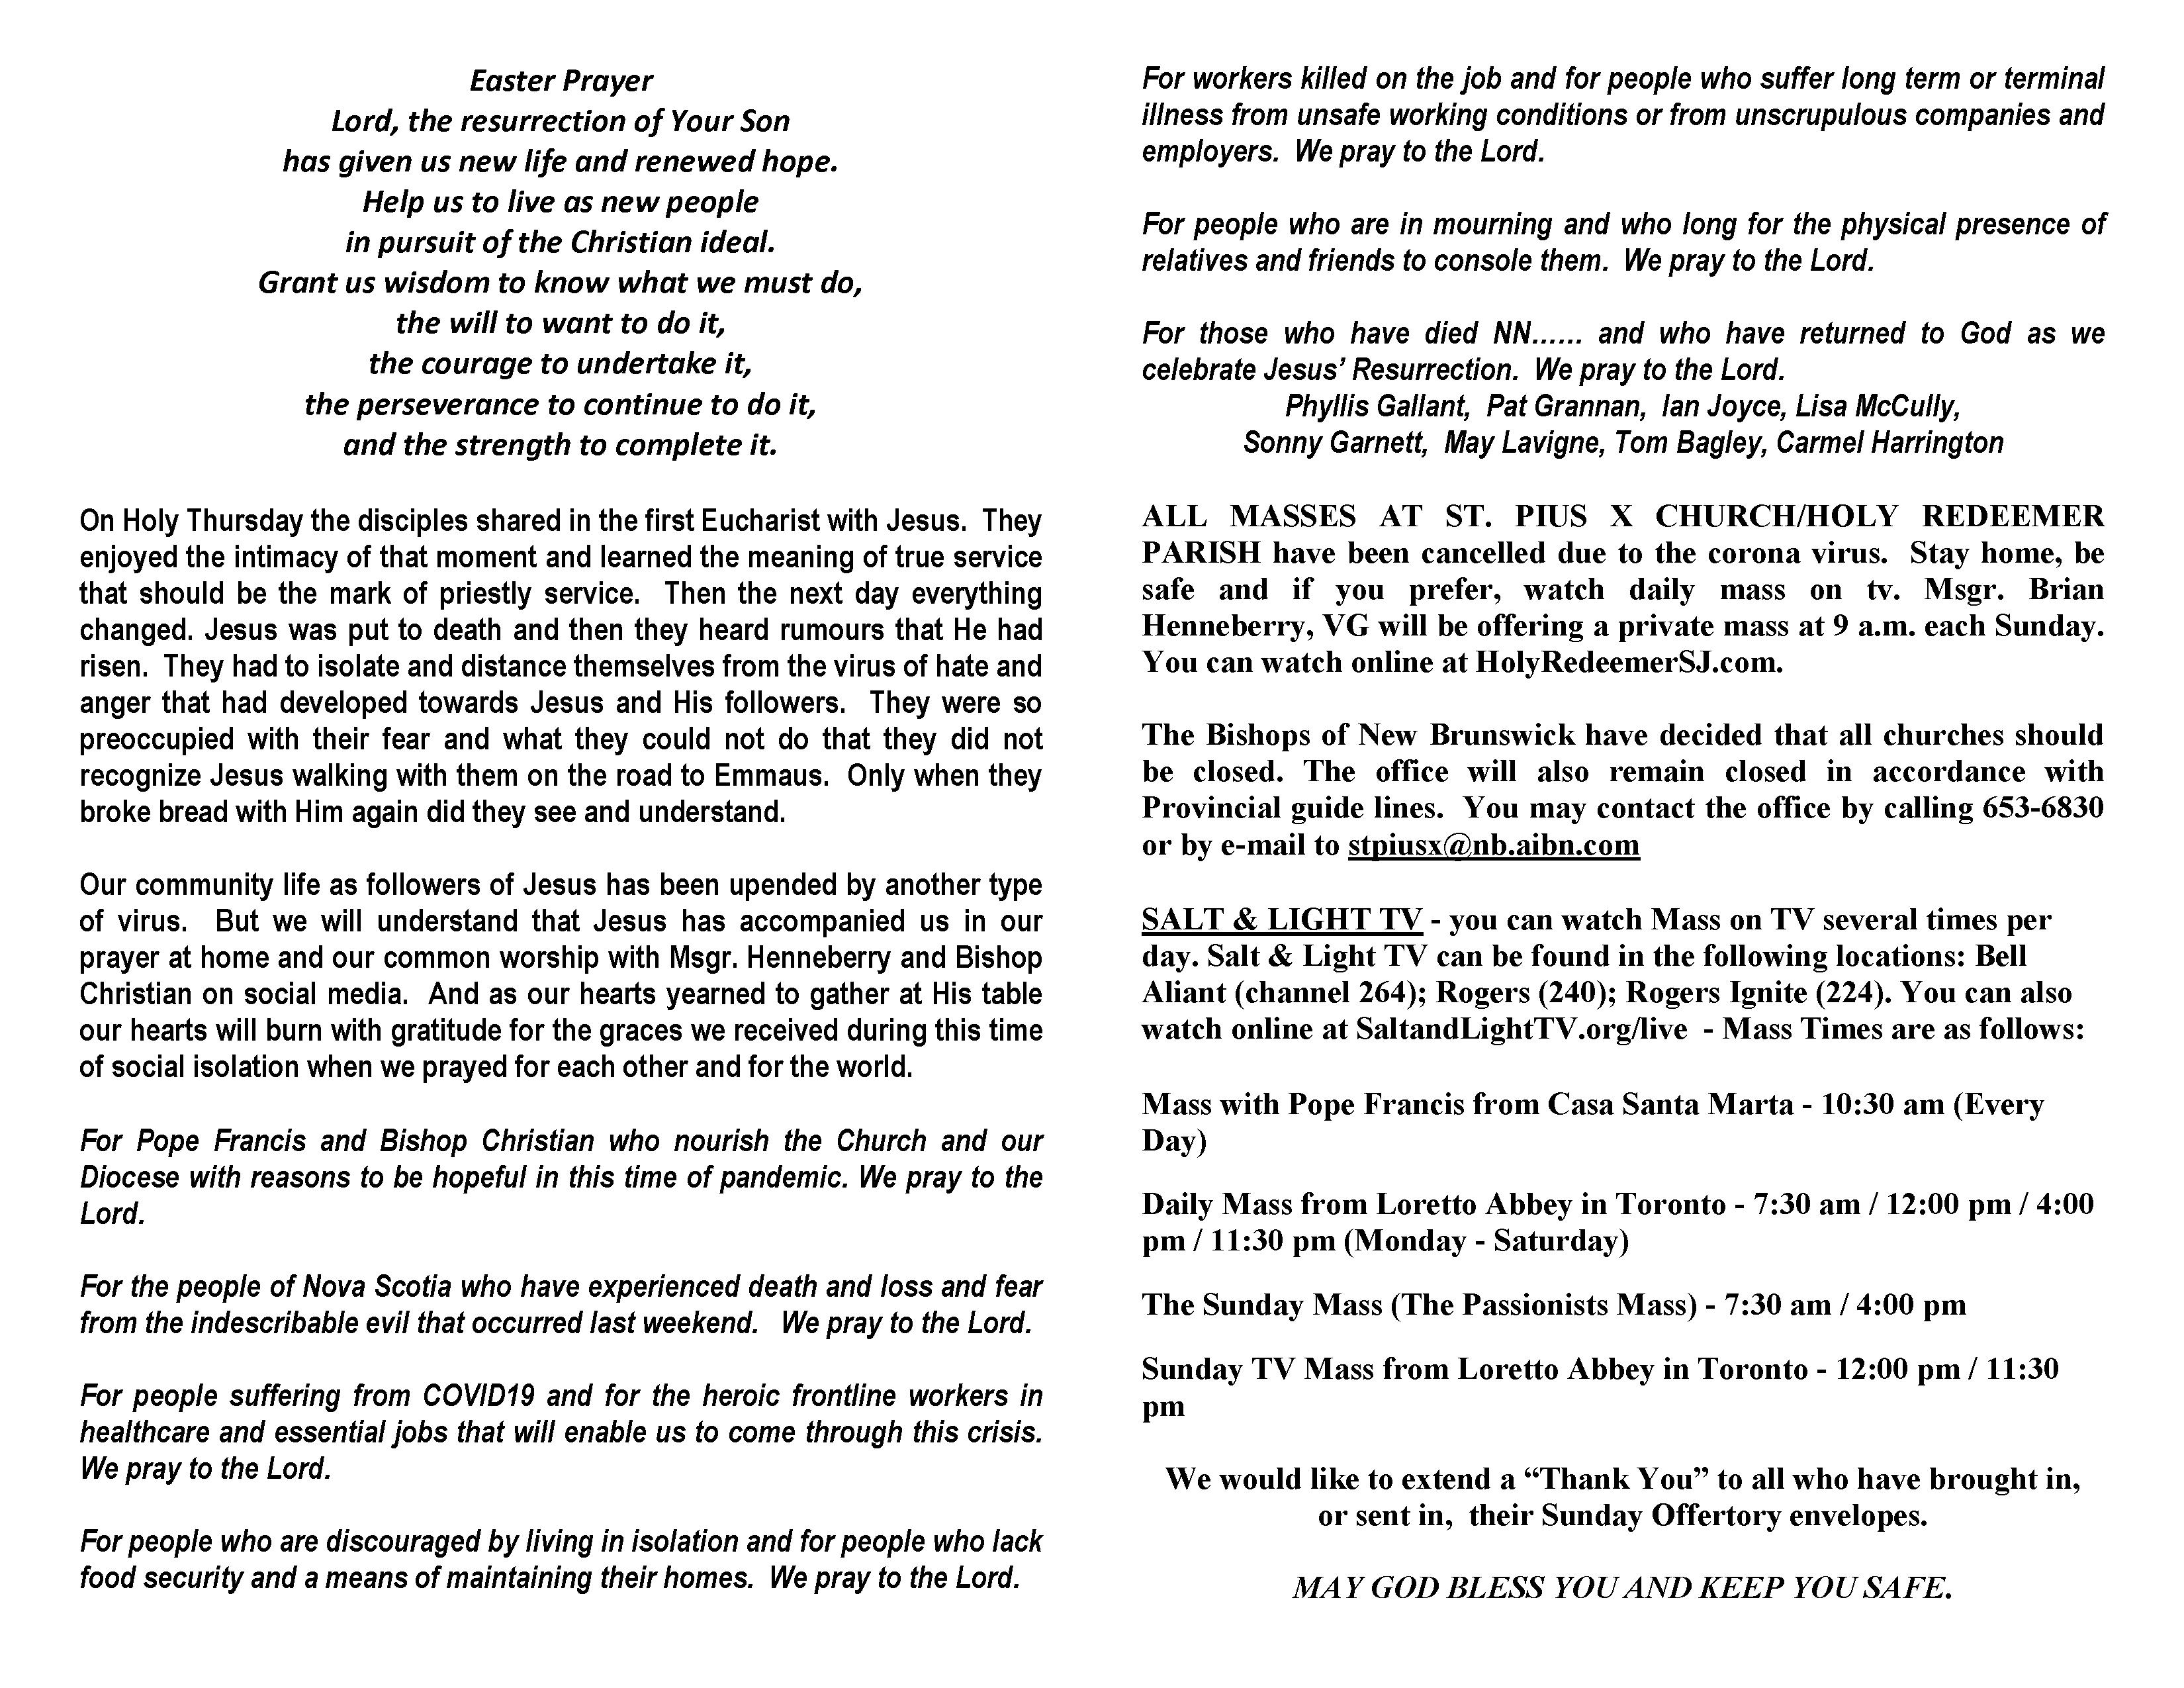 04-26-20